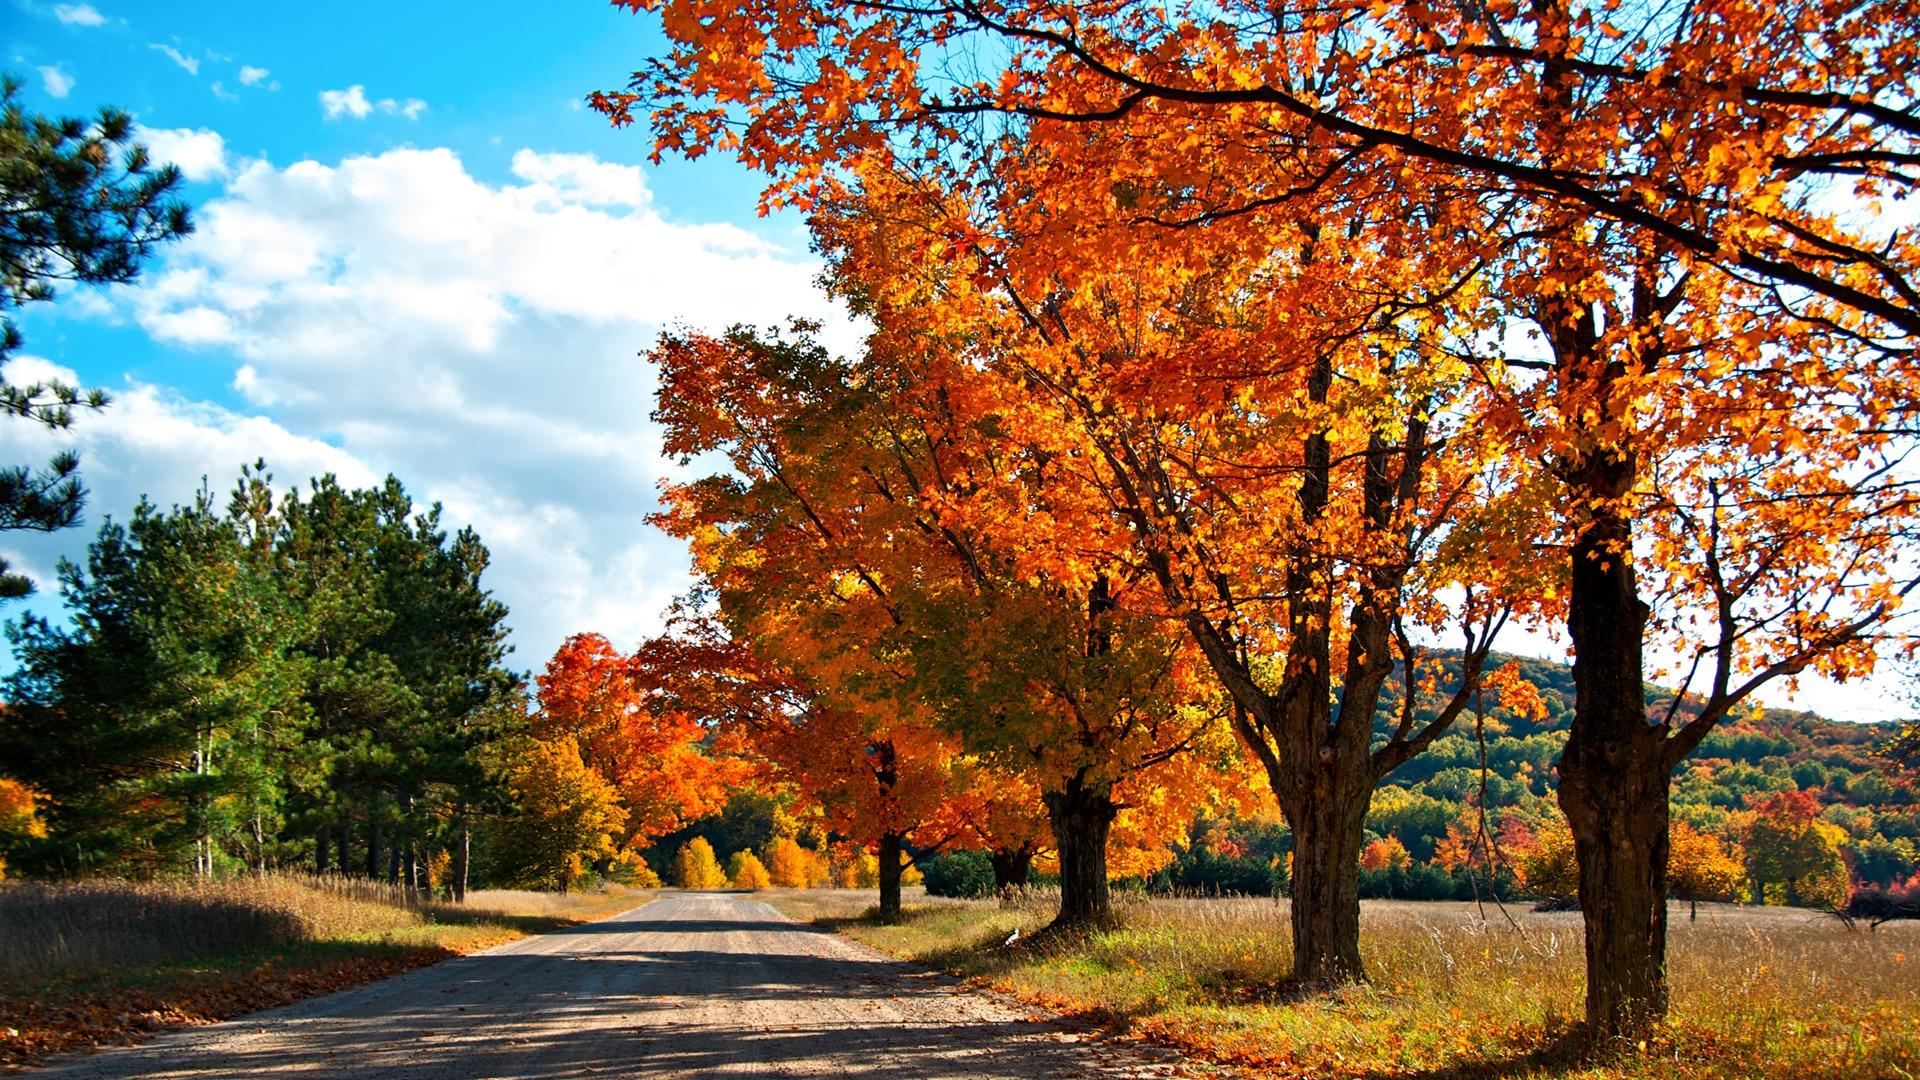 HD Autumn - HDWPlan